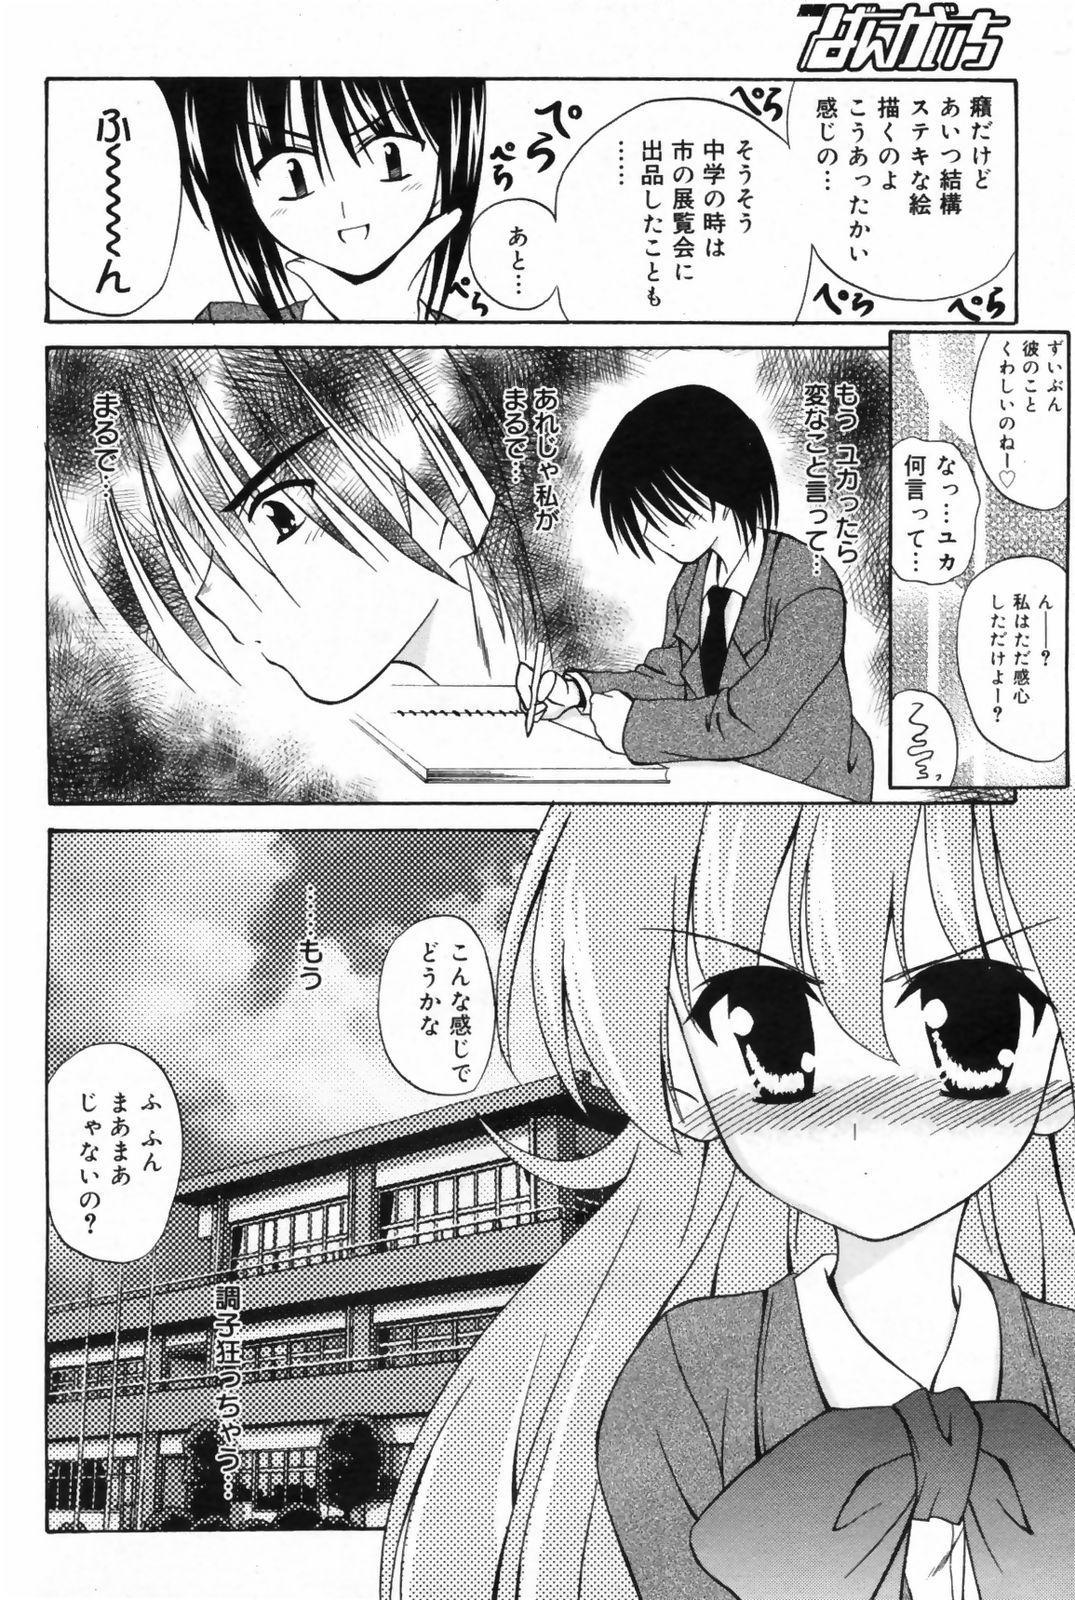 Manga Bangaichi 2009-02 Vol. 234 161